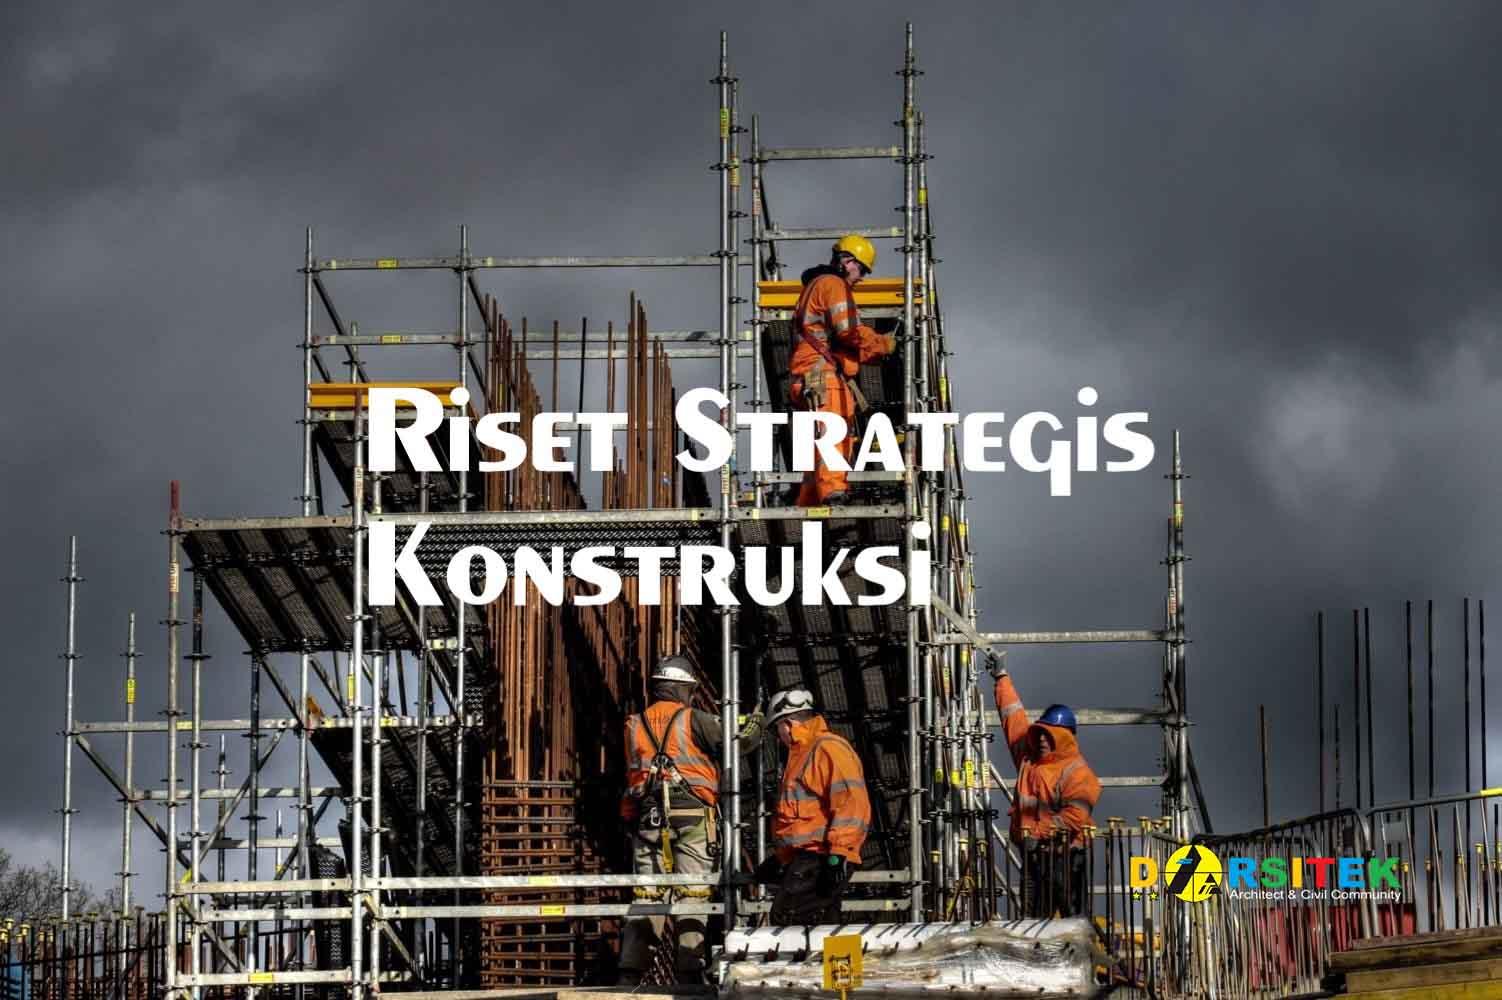 riset strategis konstruksi